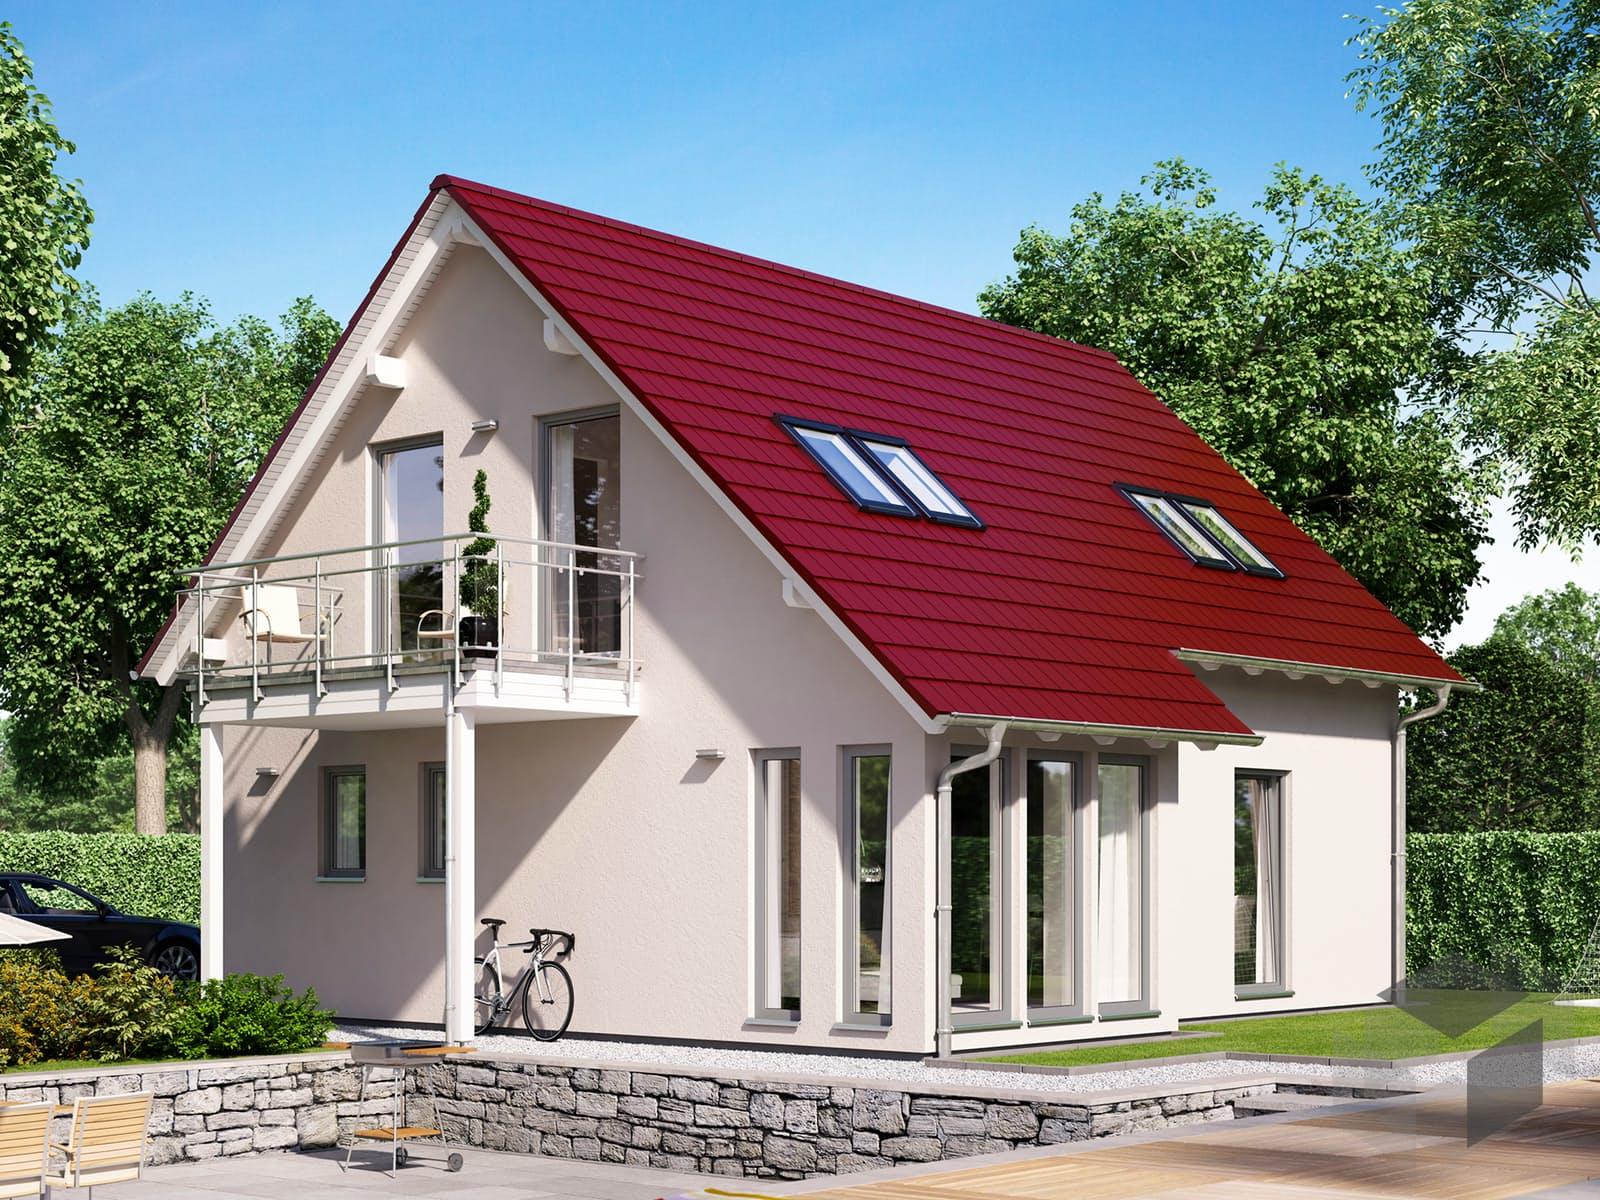 sunshine 125 v2 von living haus komplette daten bersicht. Black Bedroom Furniture Sets. Home Design Ideas